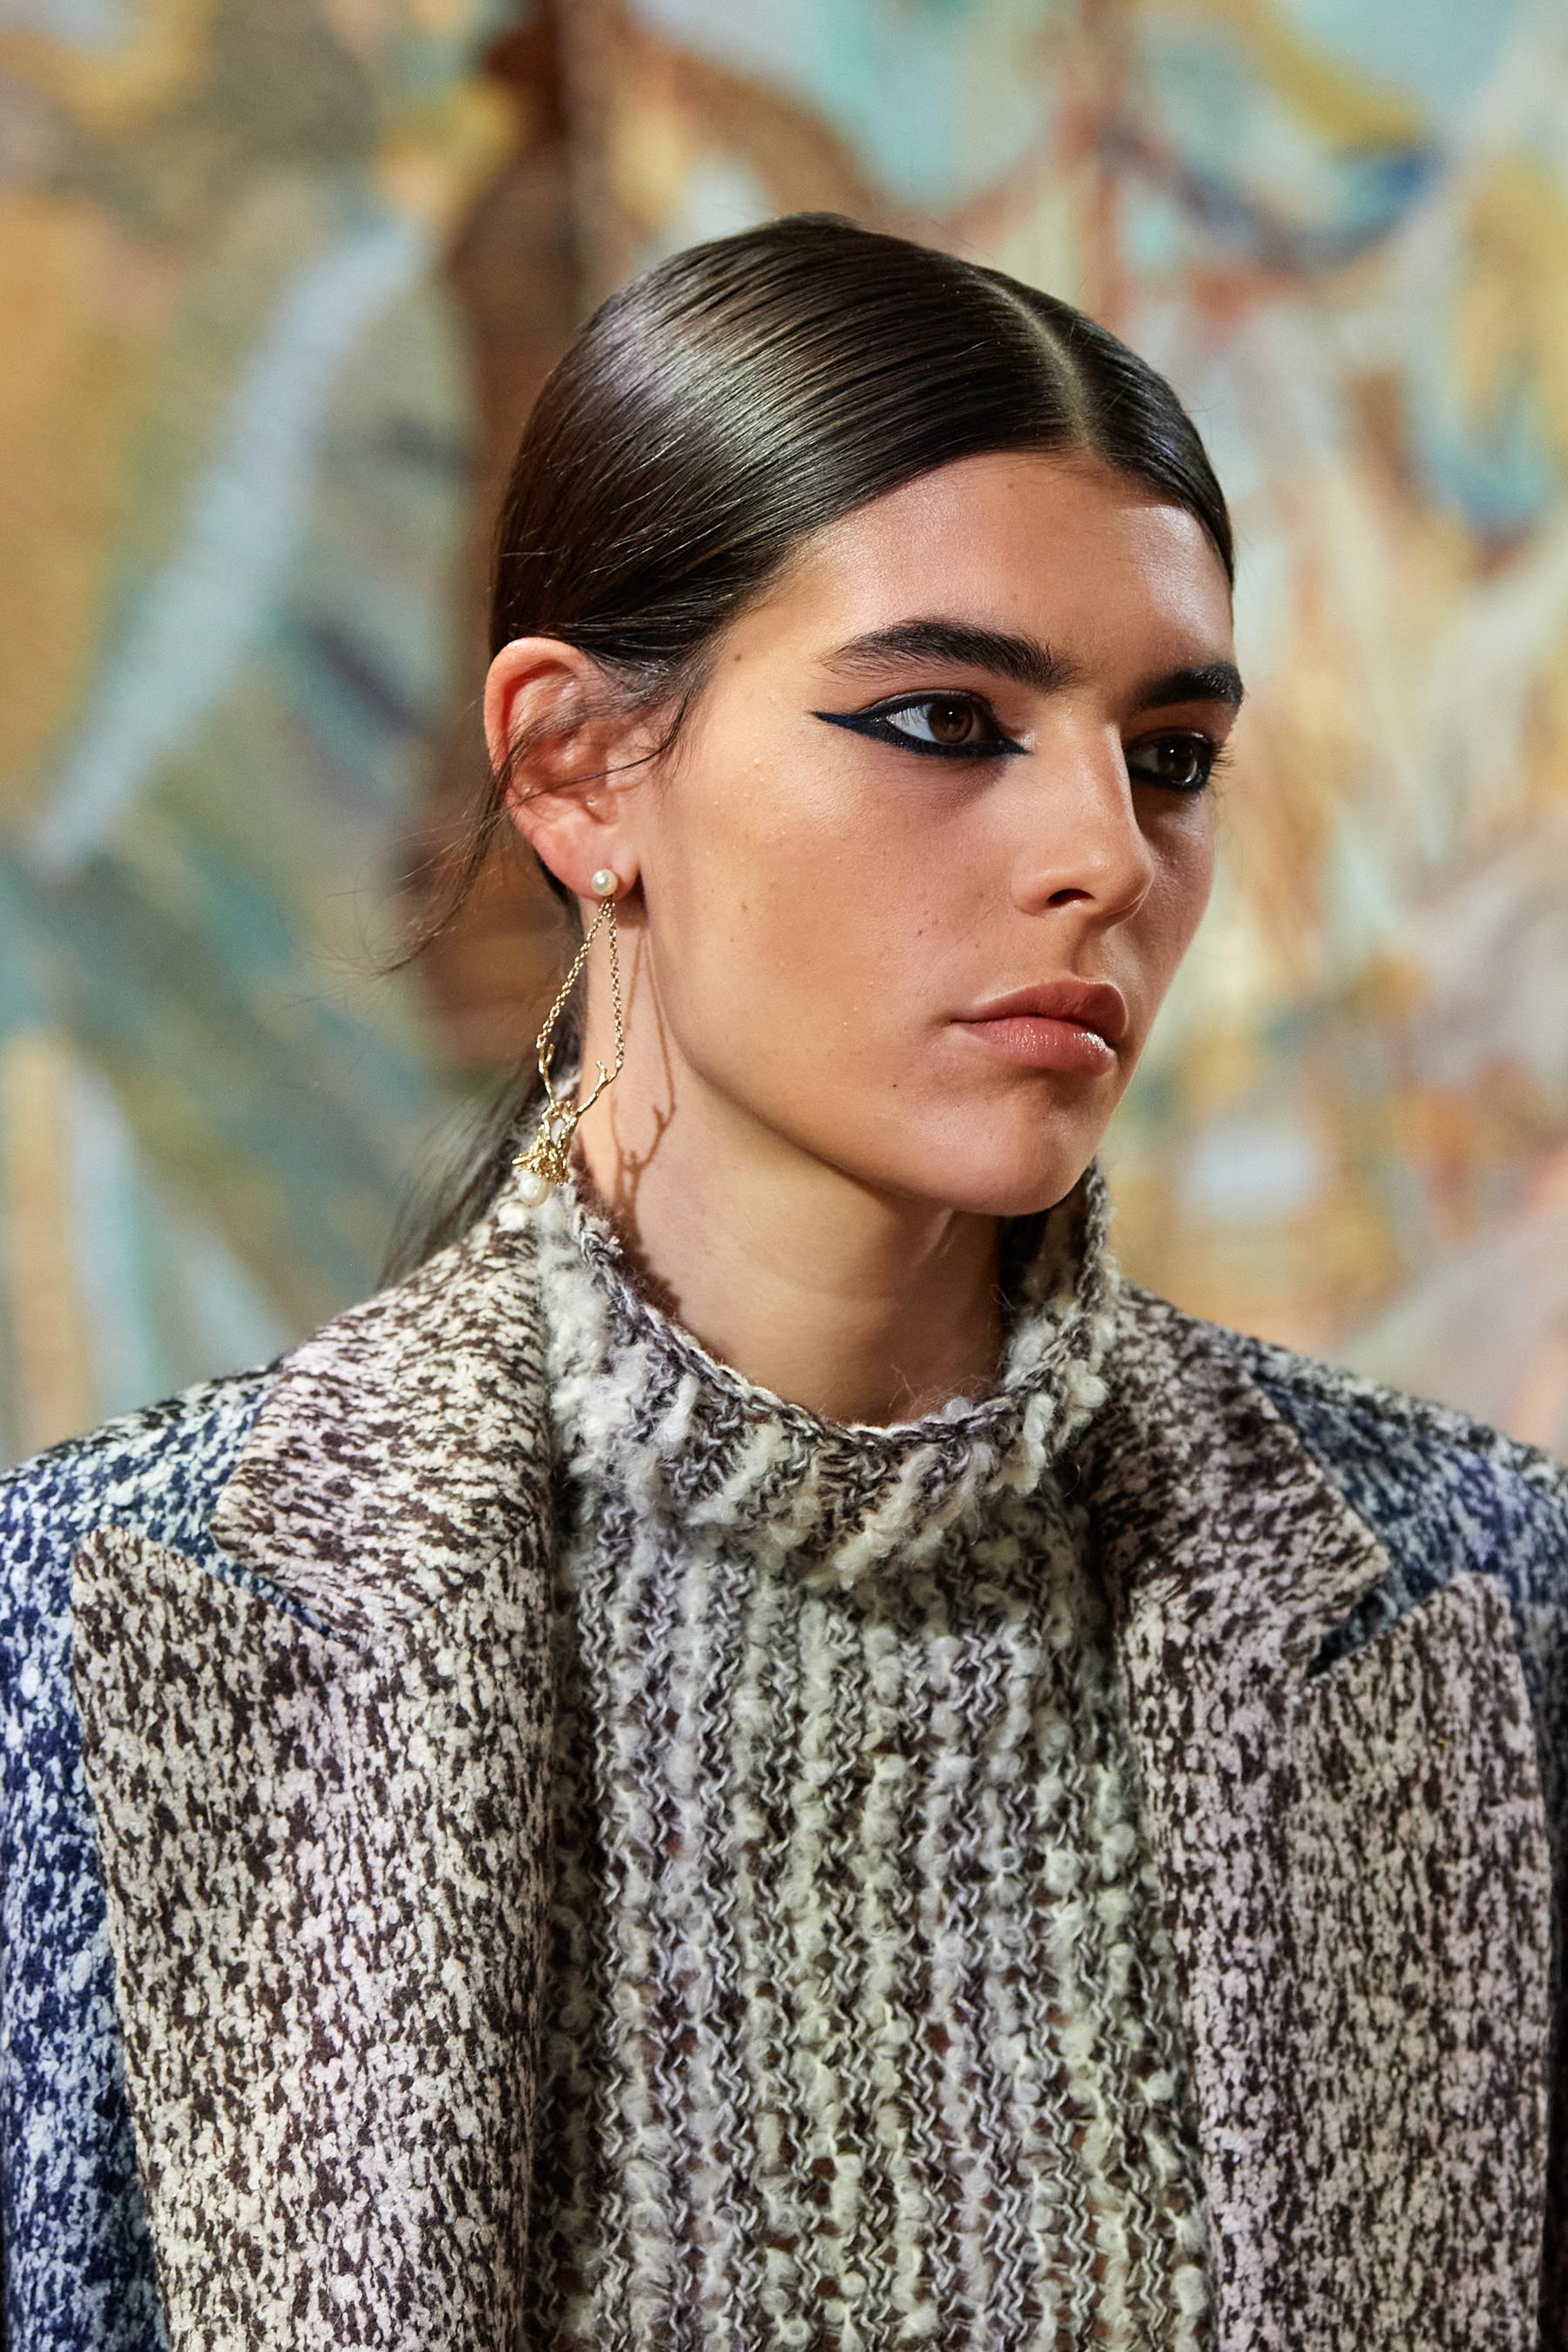 Christian Dior Fall 2021 Couture Details Fashion Show